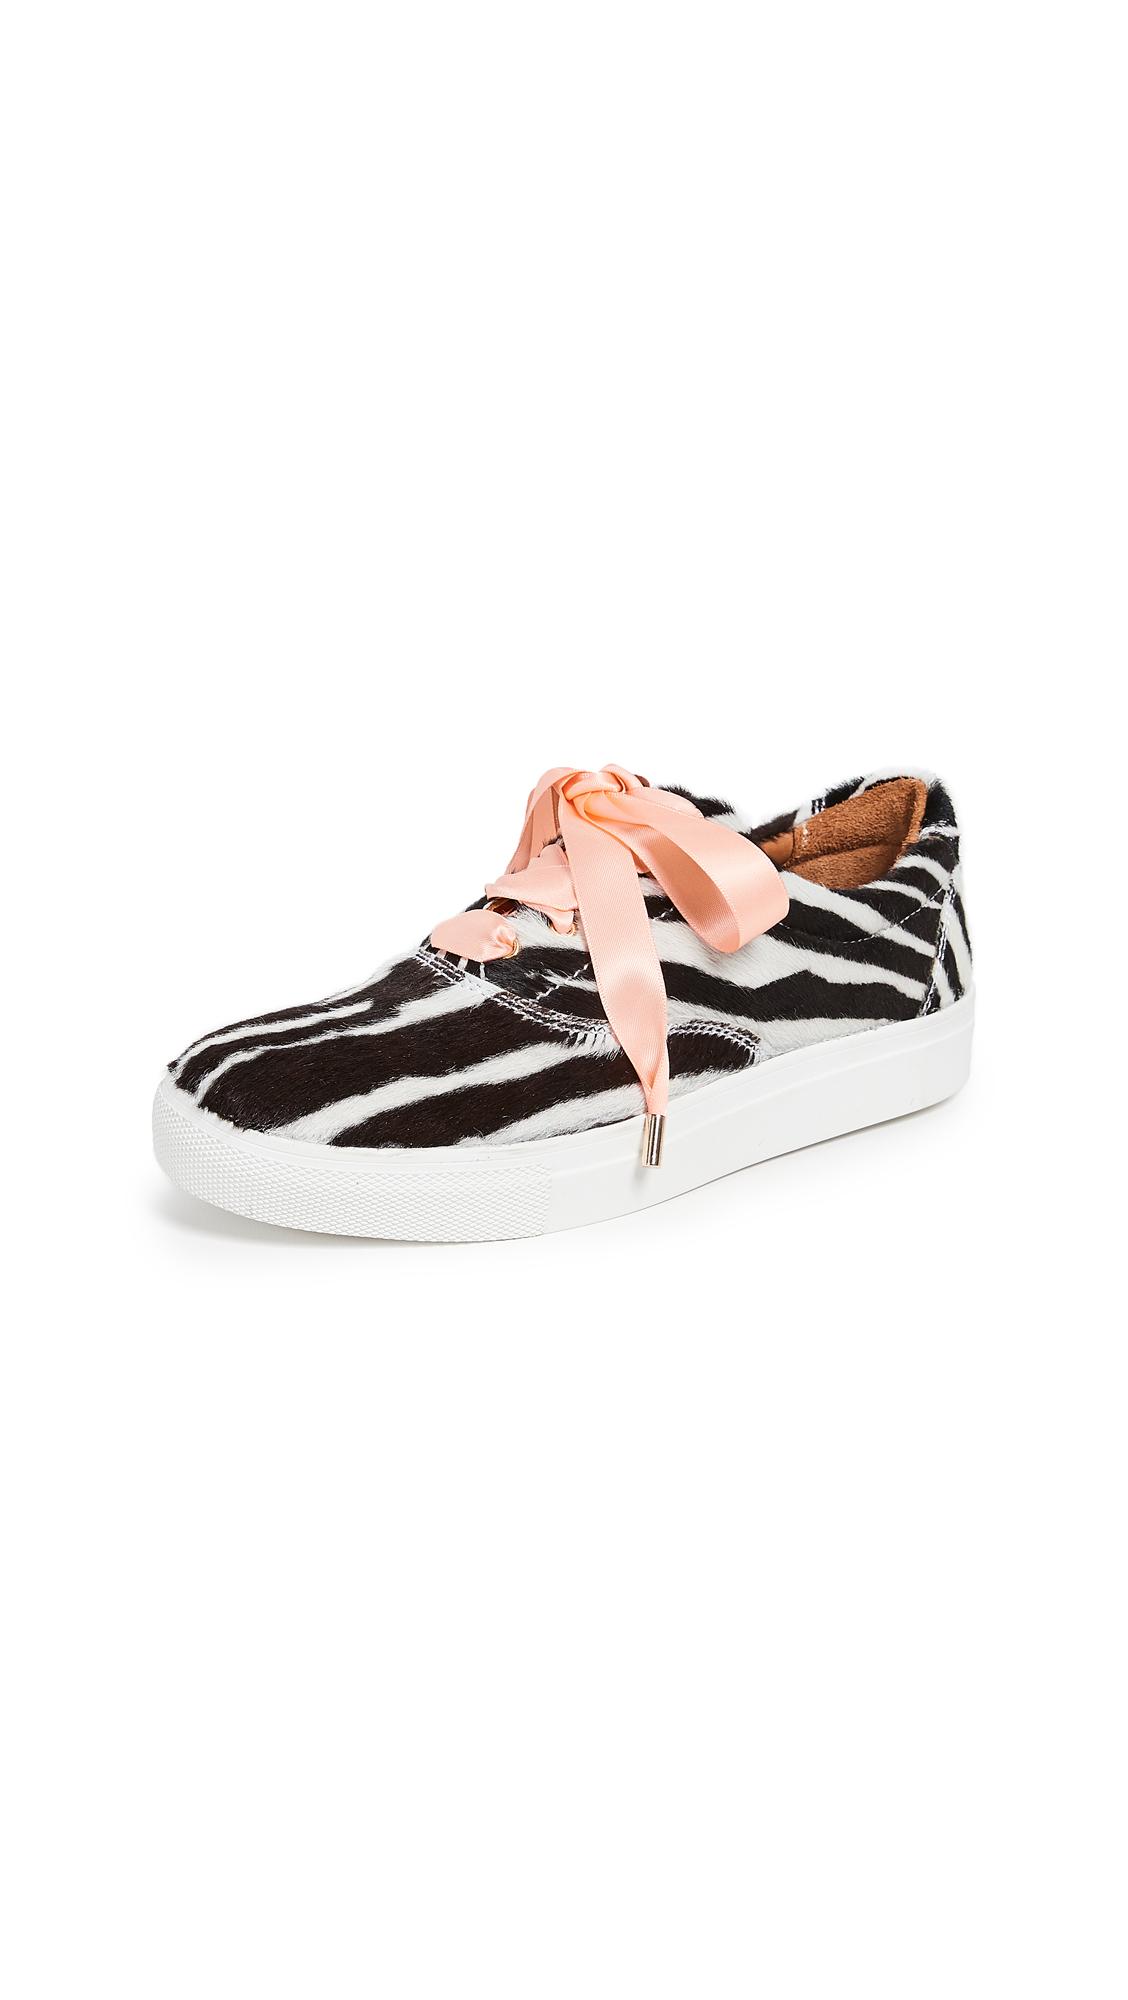 Brother Vellies Moonrise Sneakers - Zebra